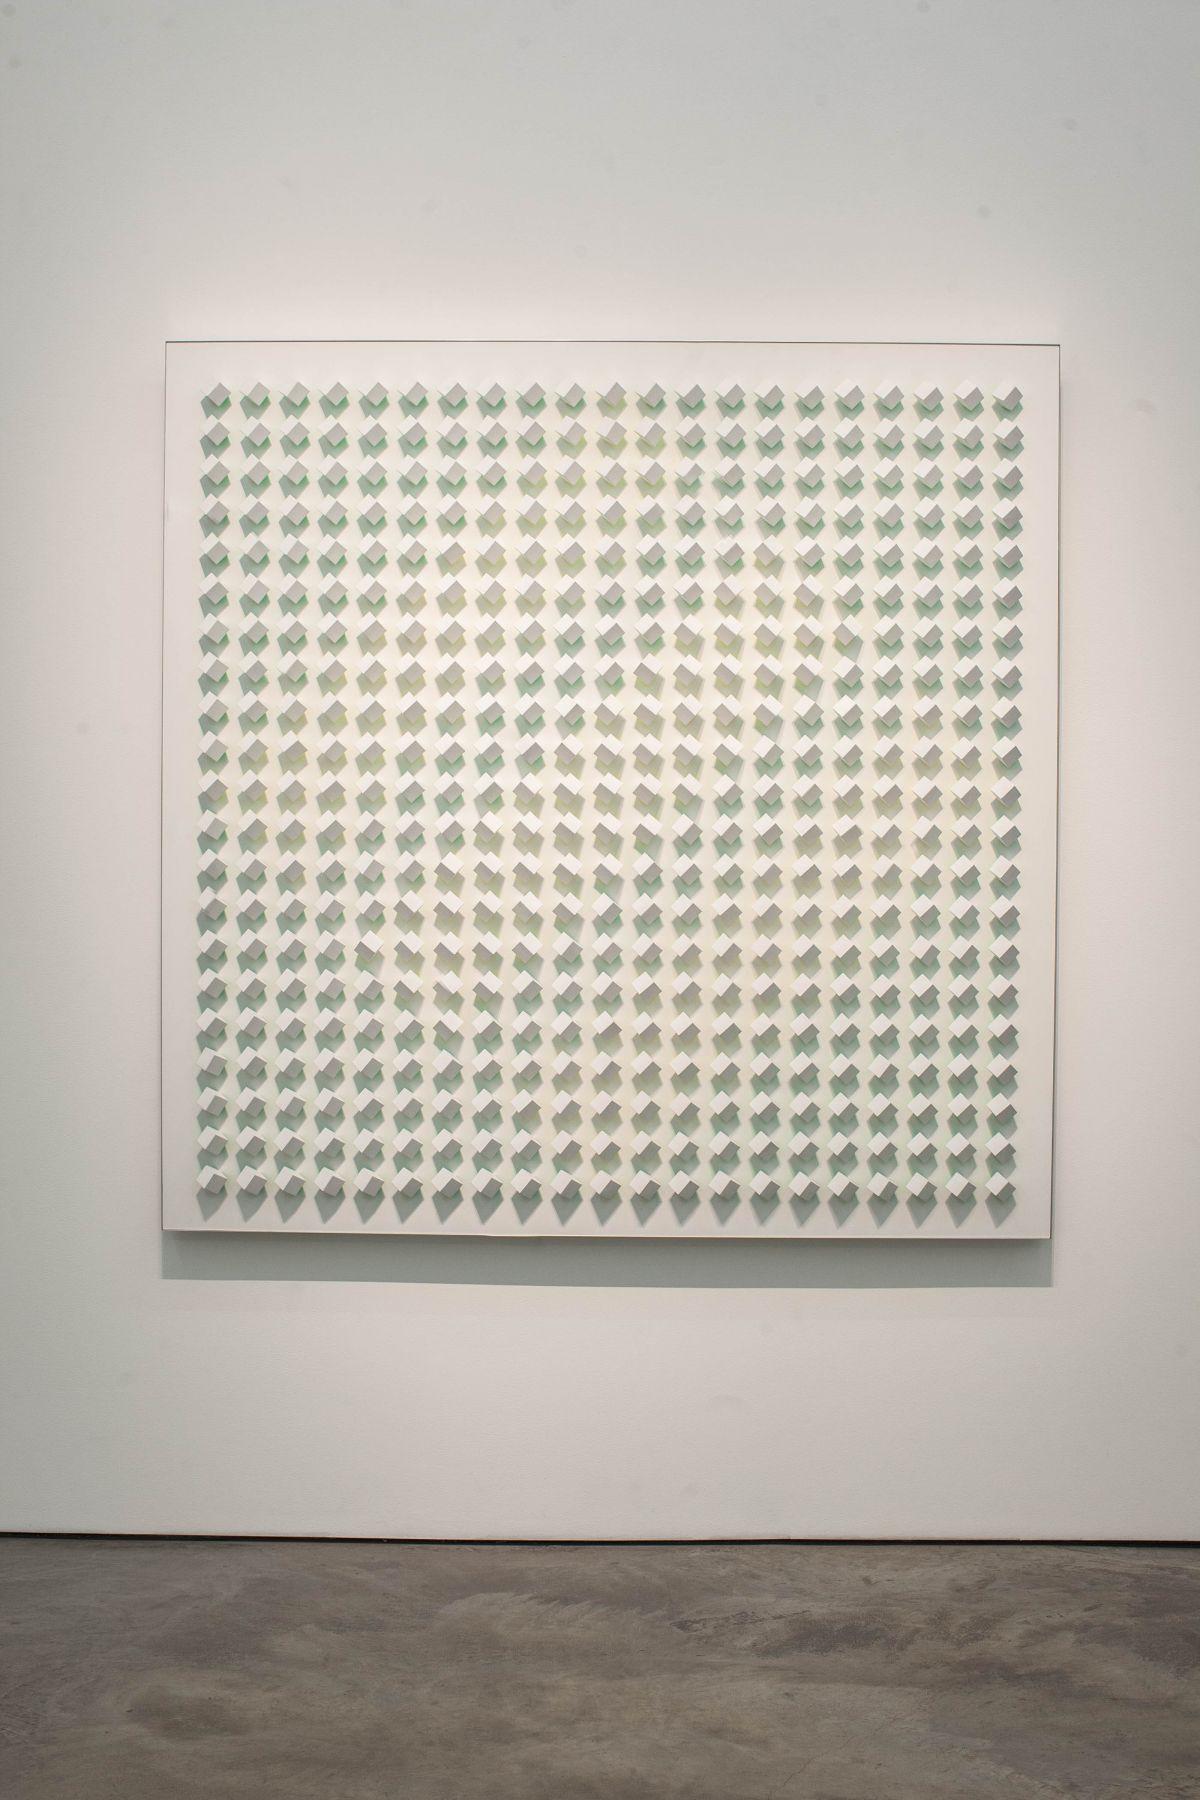 Luis Tomasello,Sculpture / VisionExhibition, Sicardi | Ayers | Bacino, 2016